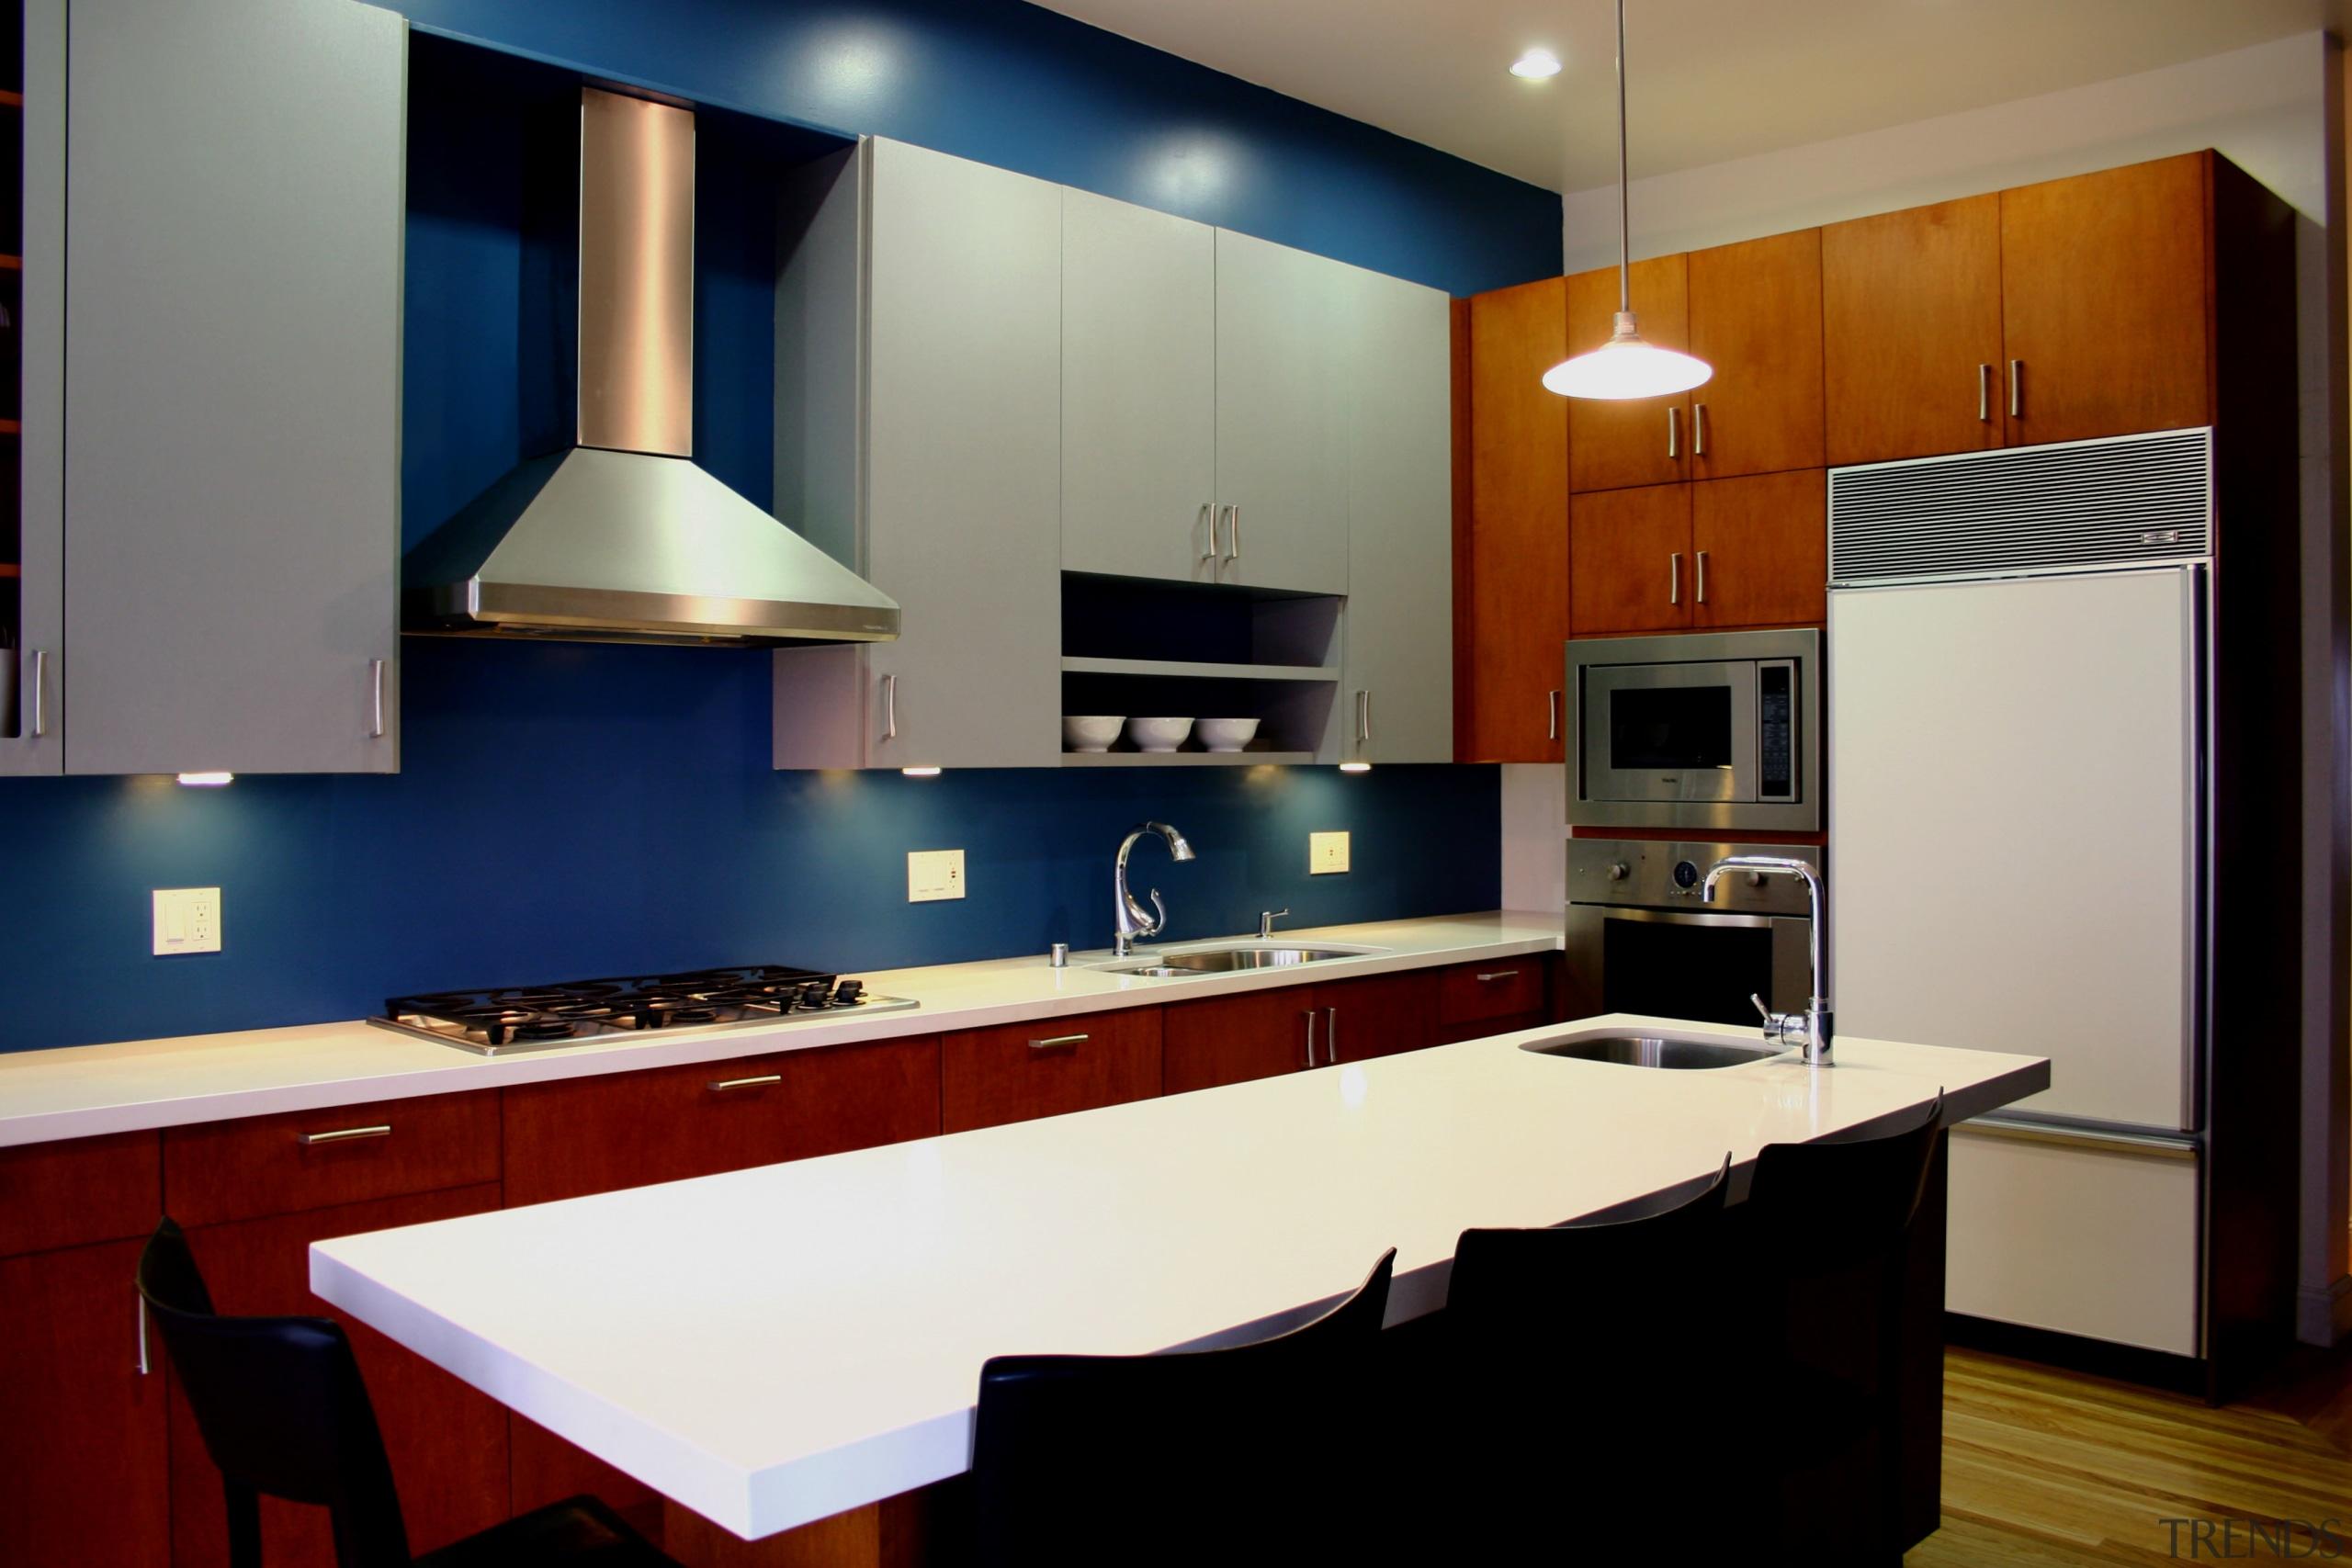 Contemporary kitchen silver maple cabinets - Contemporary kitchen cabinetry, countertop, interior design, kitchen, room